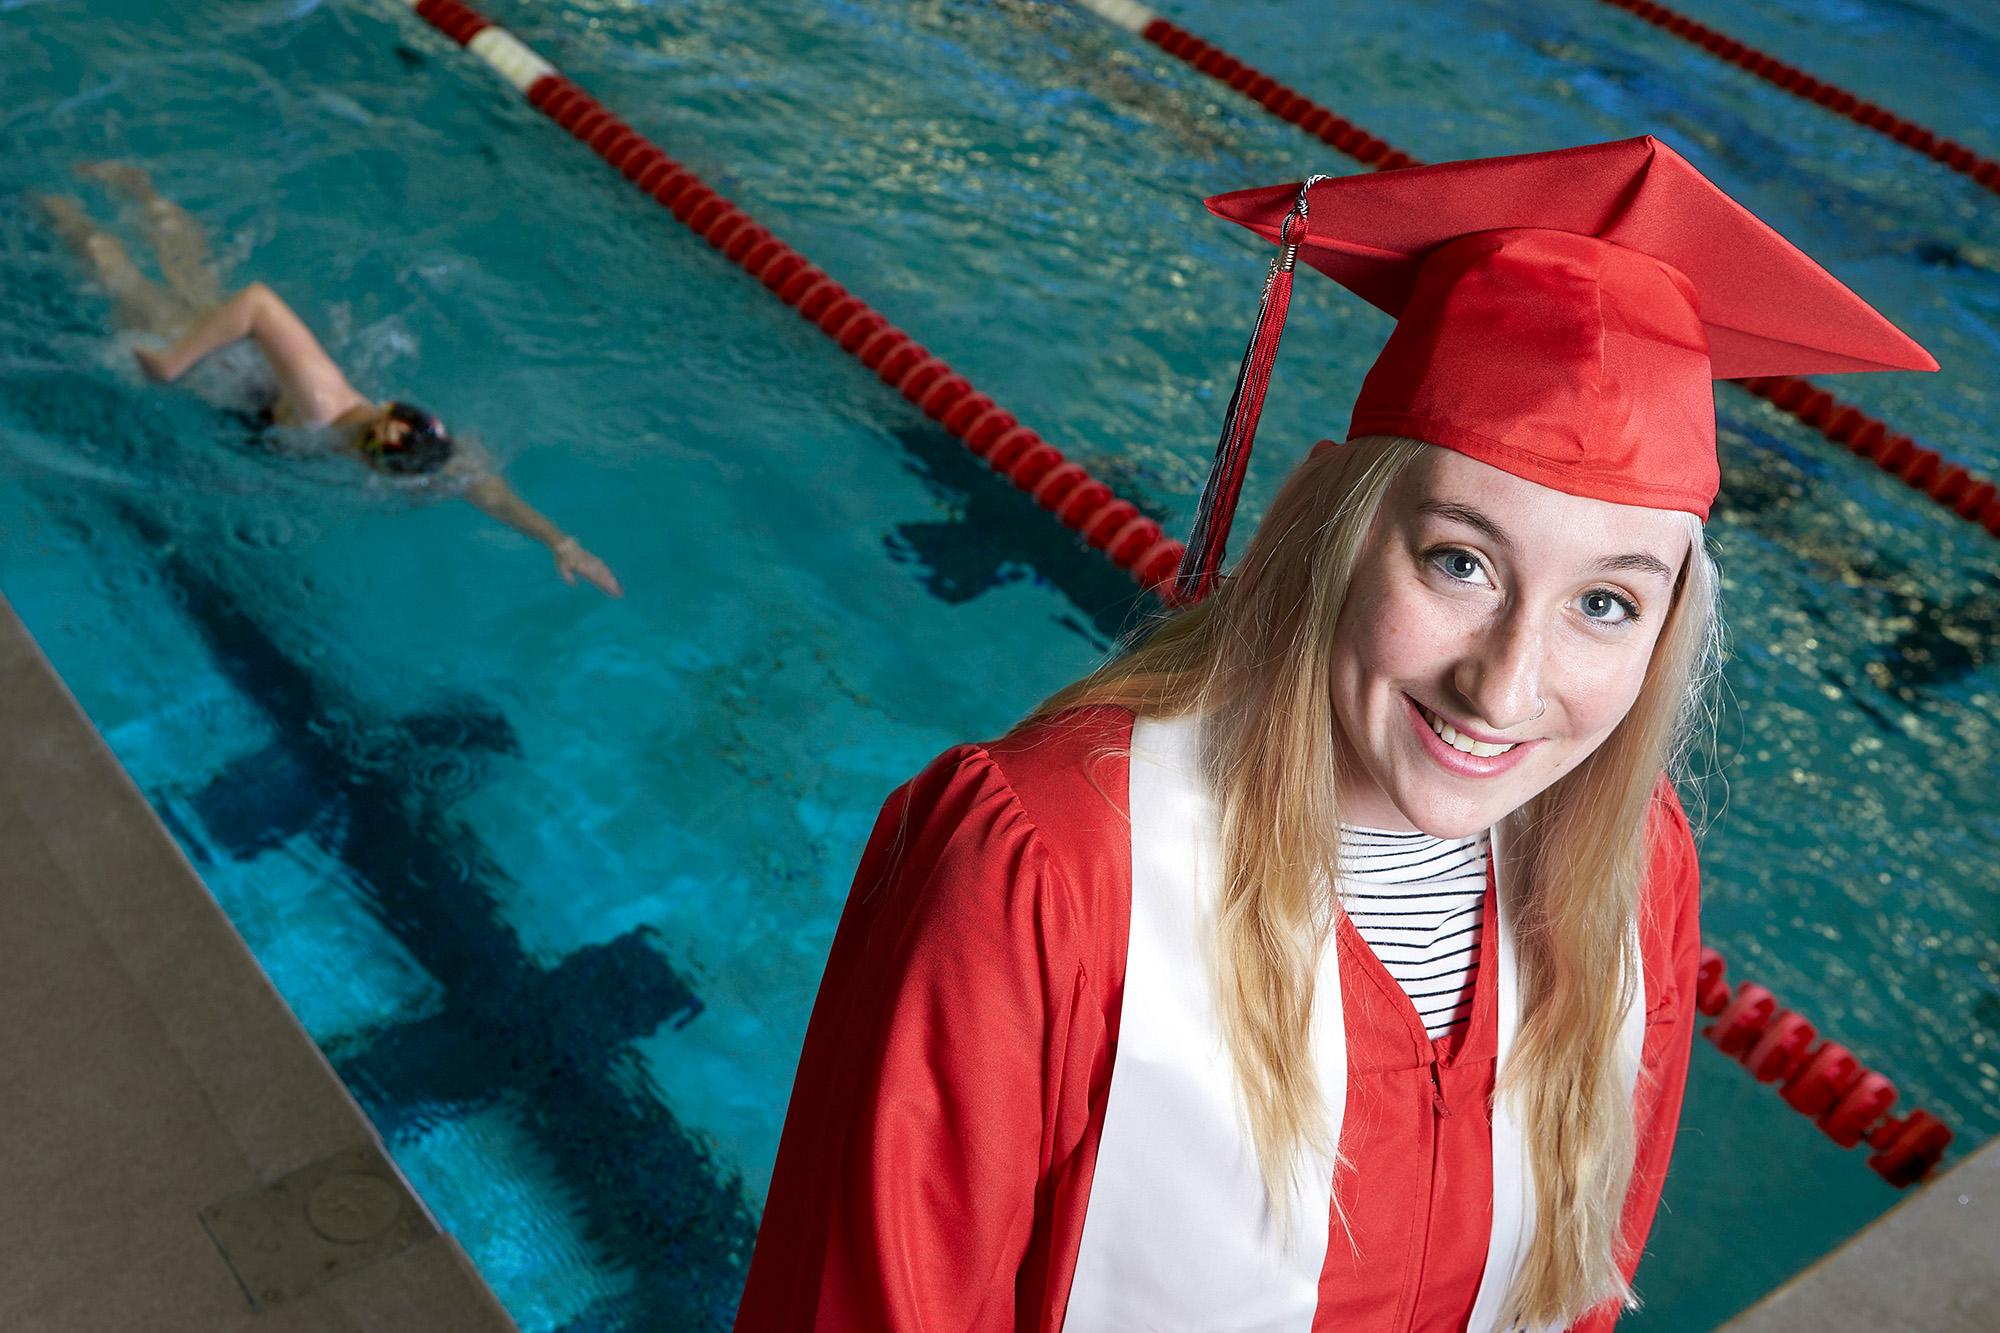 Swim Captain Set to Make a Splash at Commencement | News Center ...